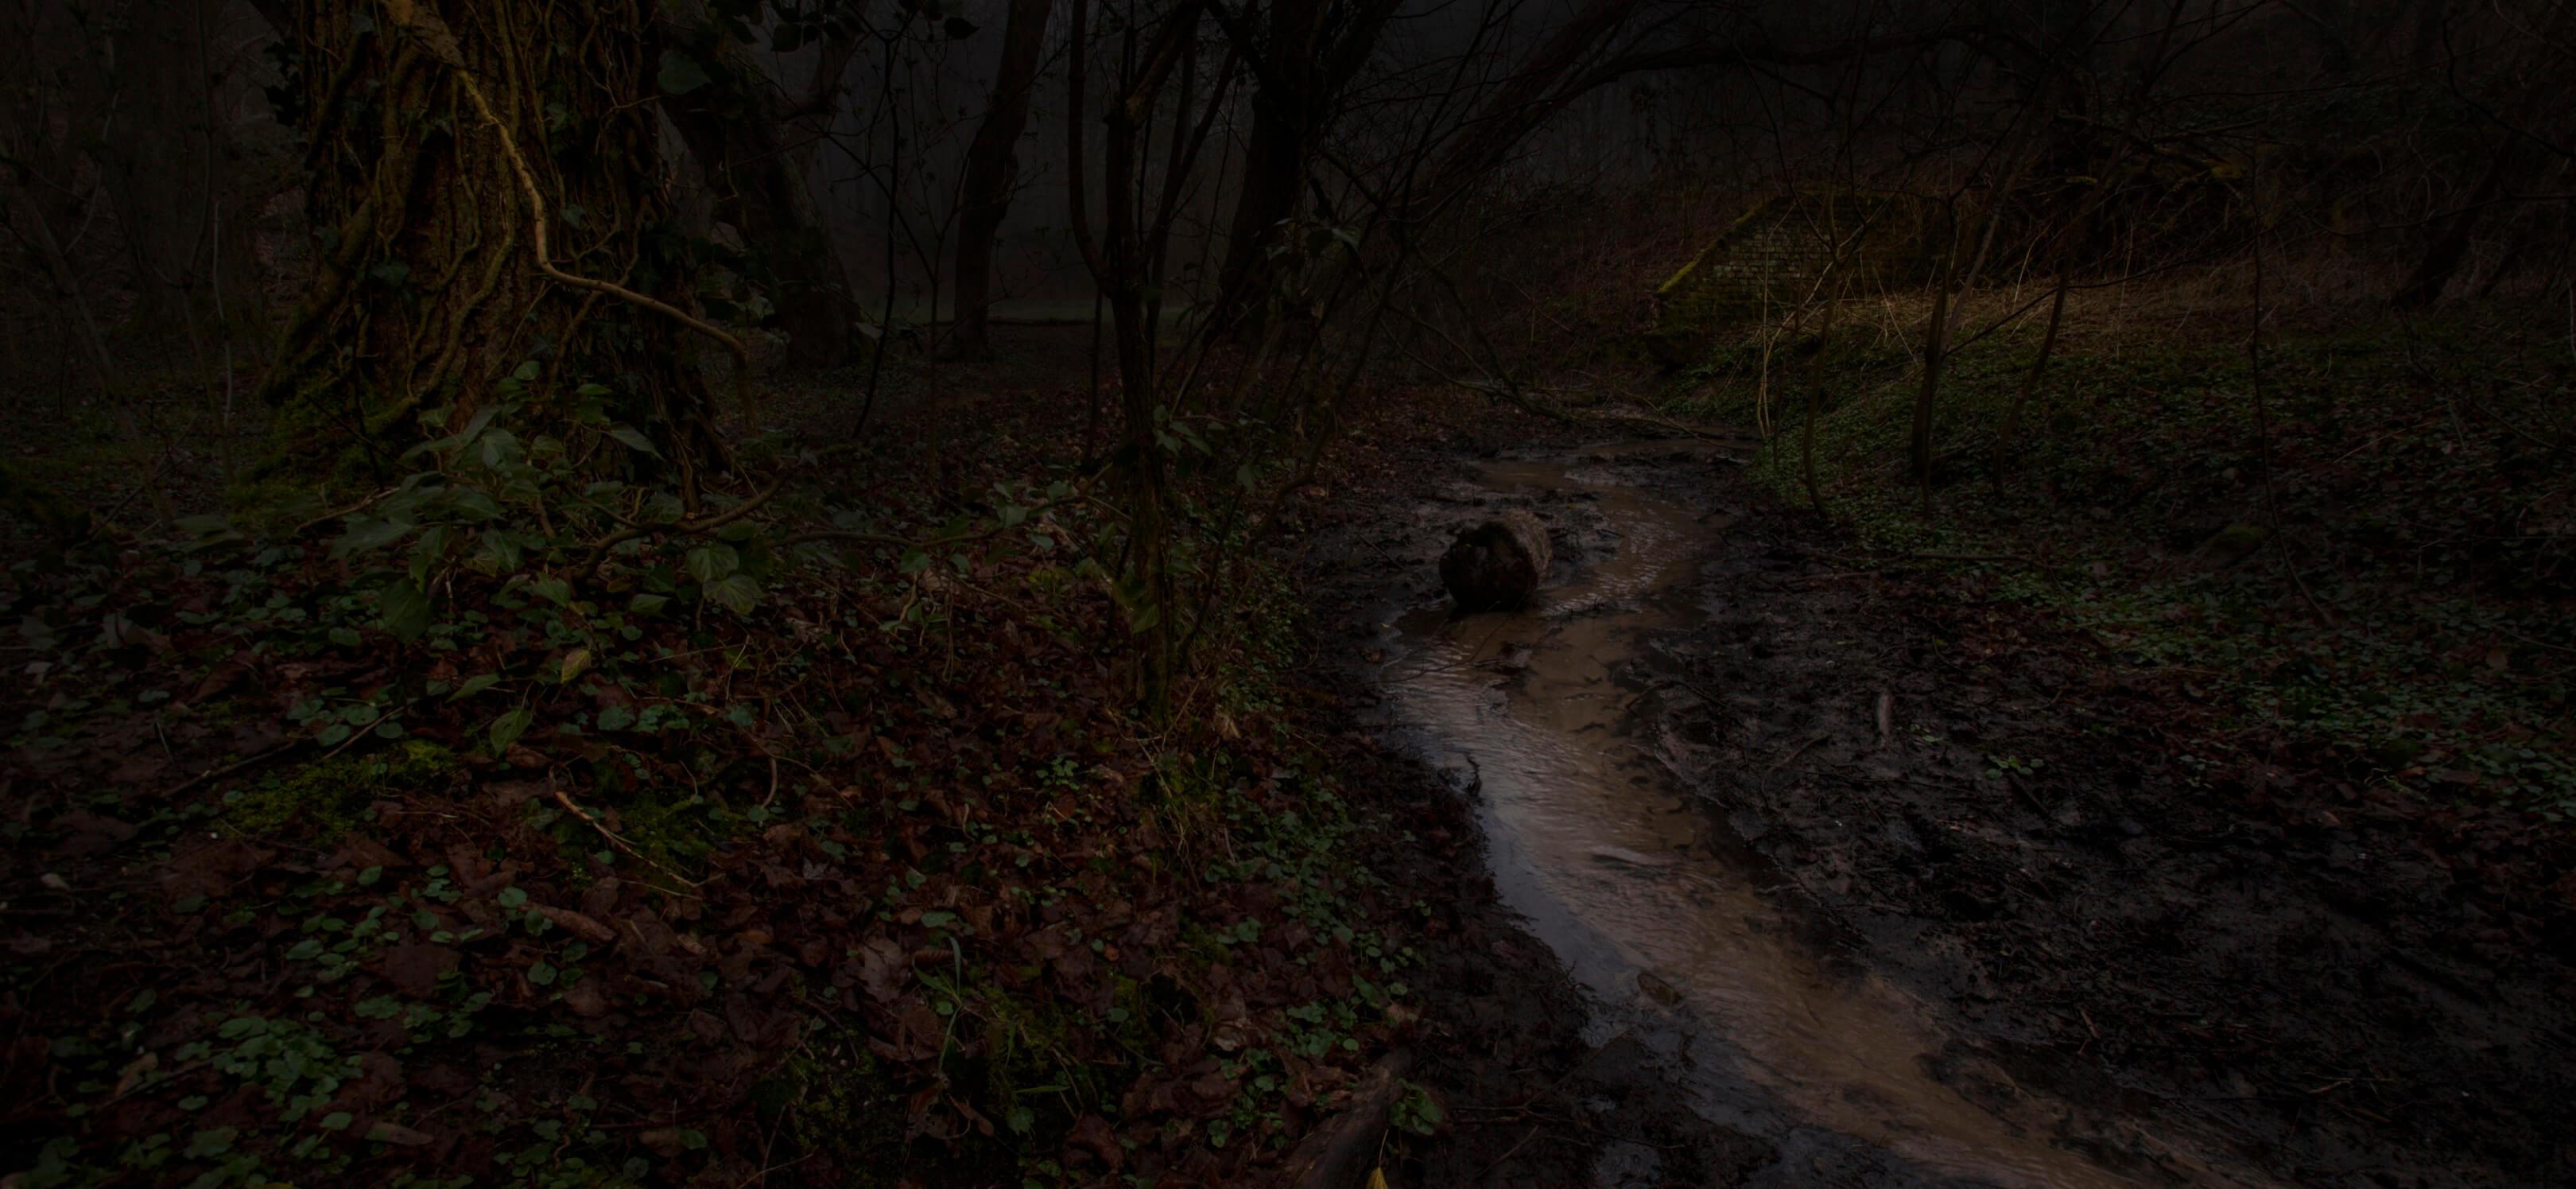 Jur Jurjen Poeles fotografie fragment landschap from dusk till dawn duister ochtendgloren dageraad vrijwerk vrij werk kunst kunstfotografie beek bos